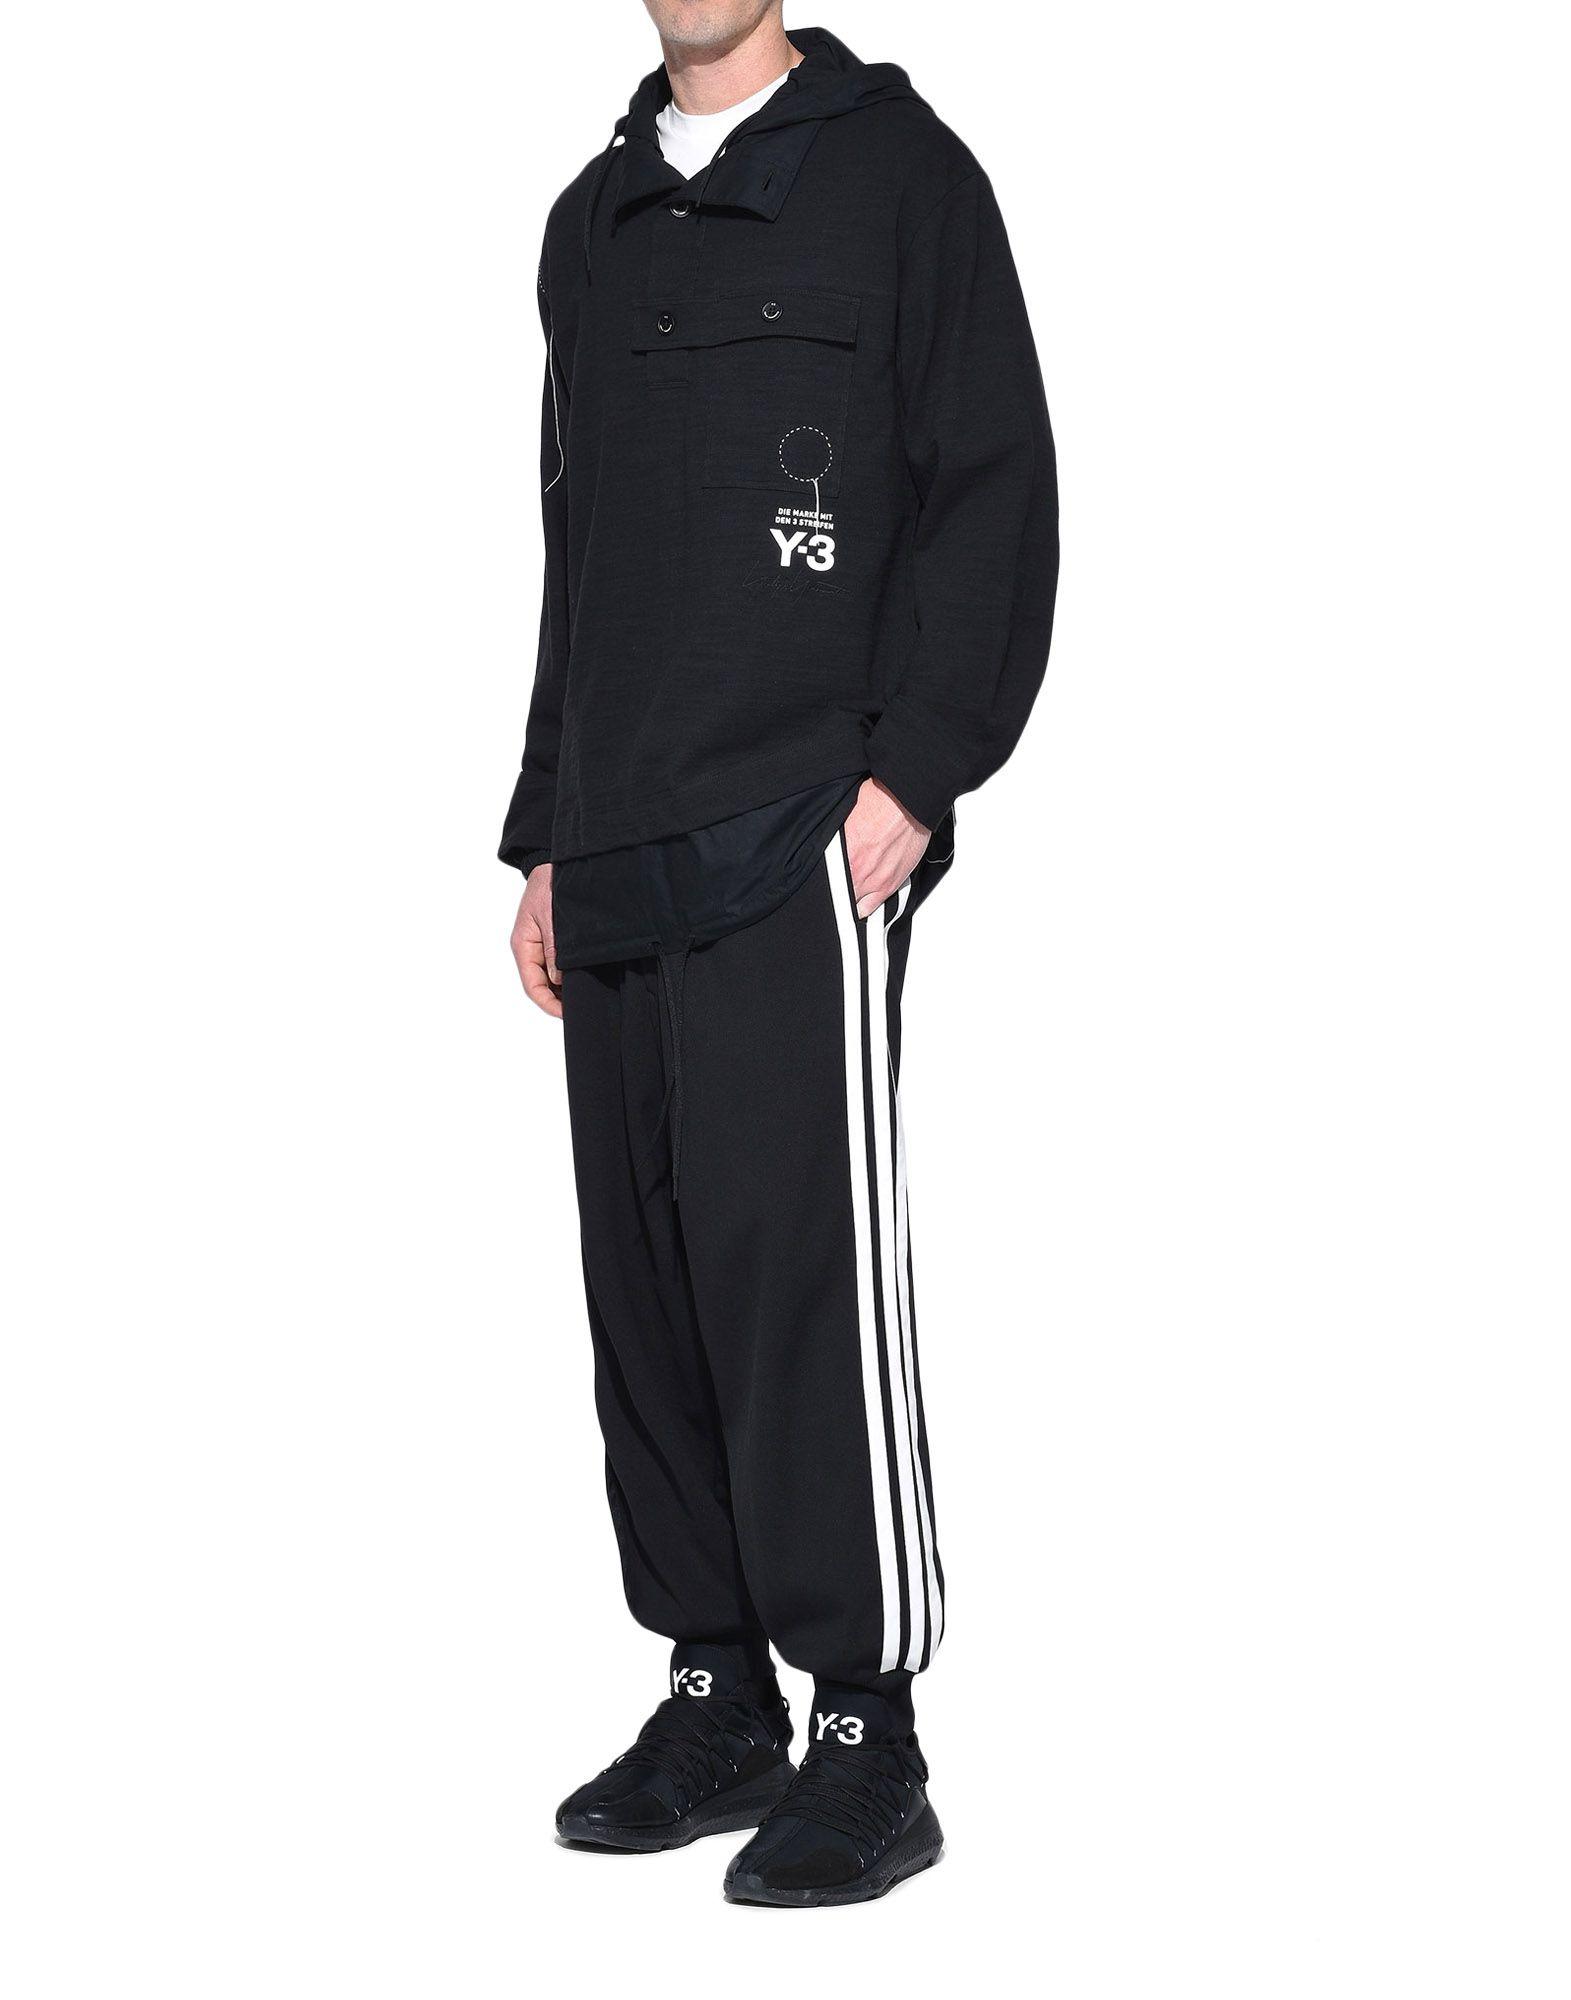 Y-3 Y-3 Sashiko Layered Hoodie Hooded sweatshirt Man a